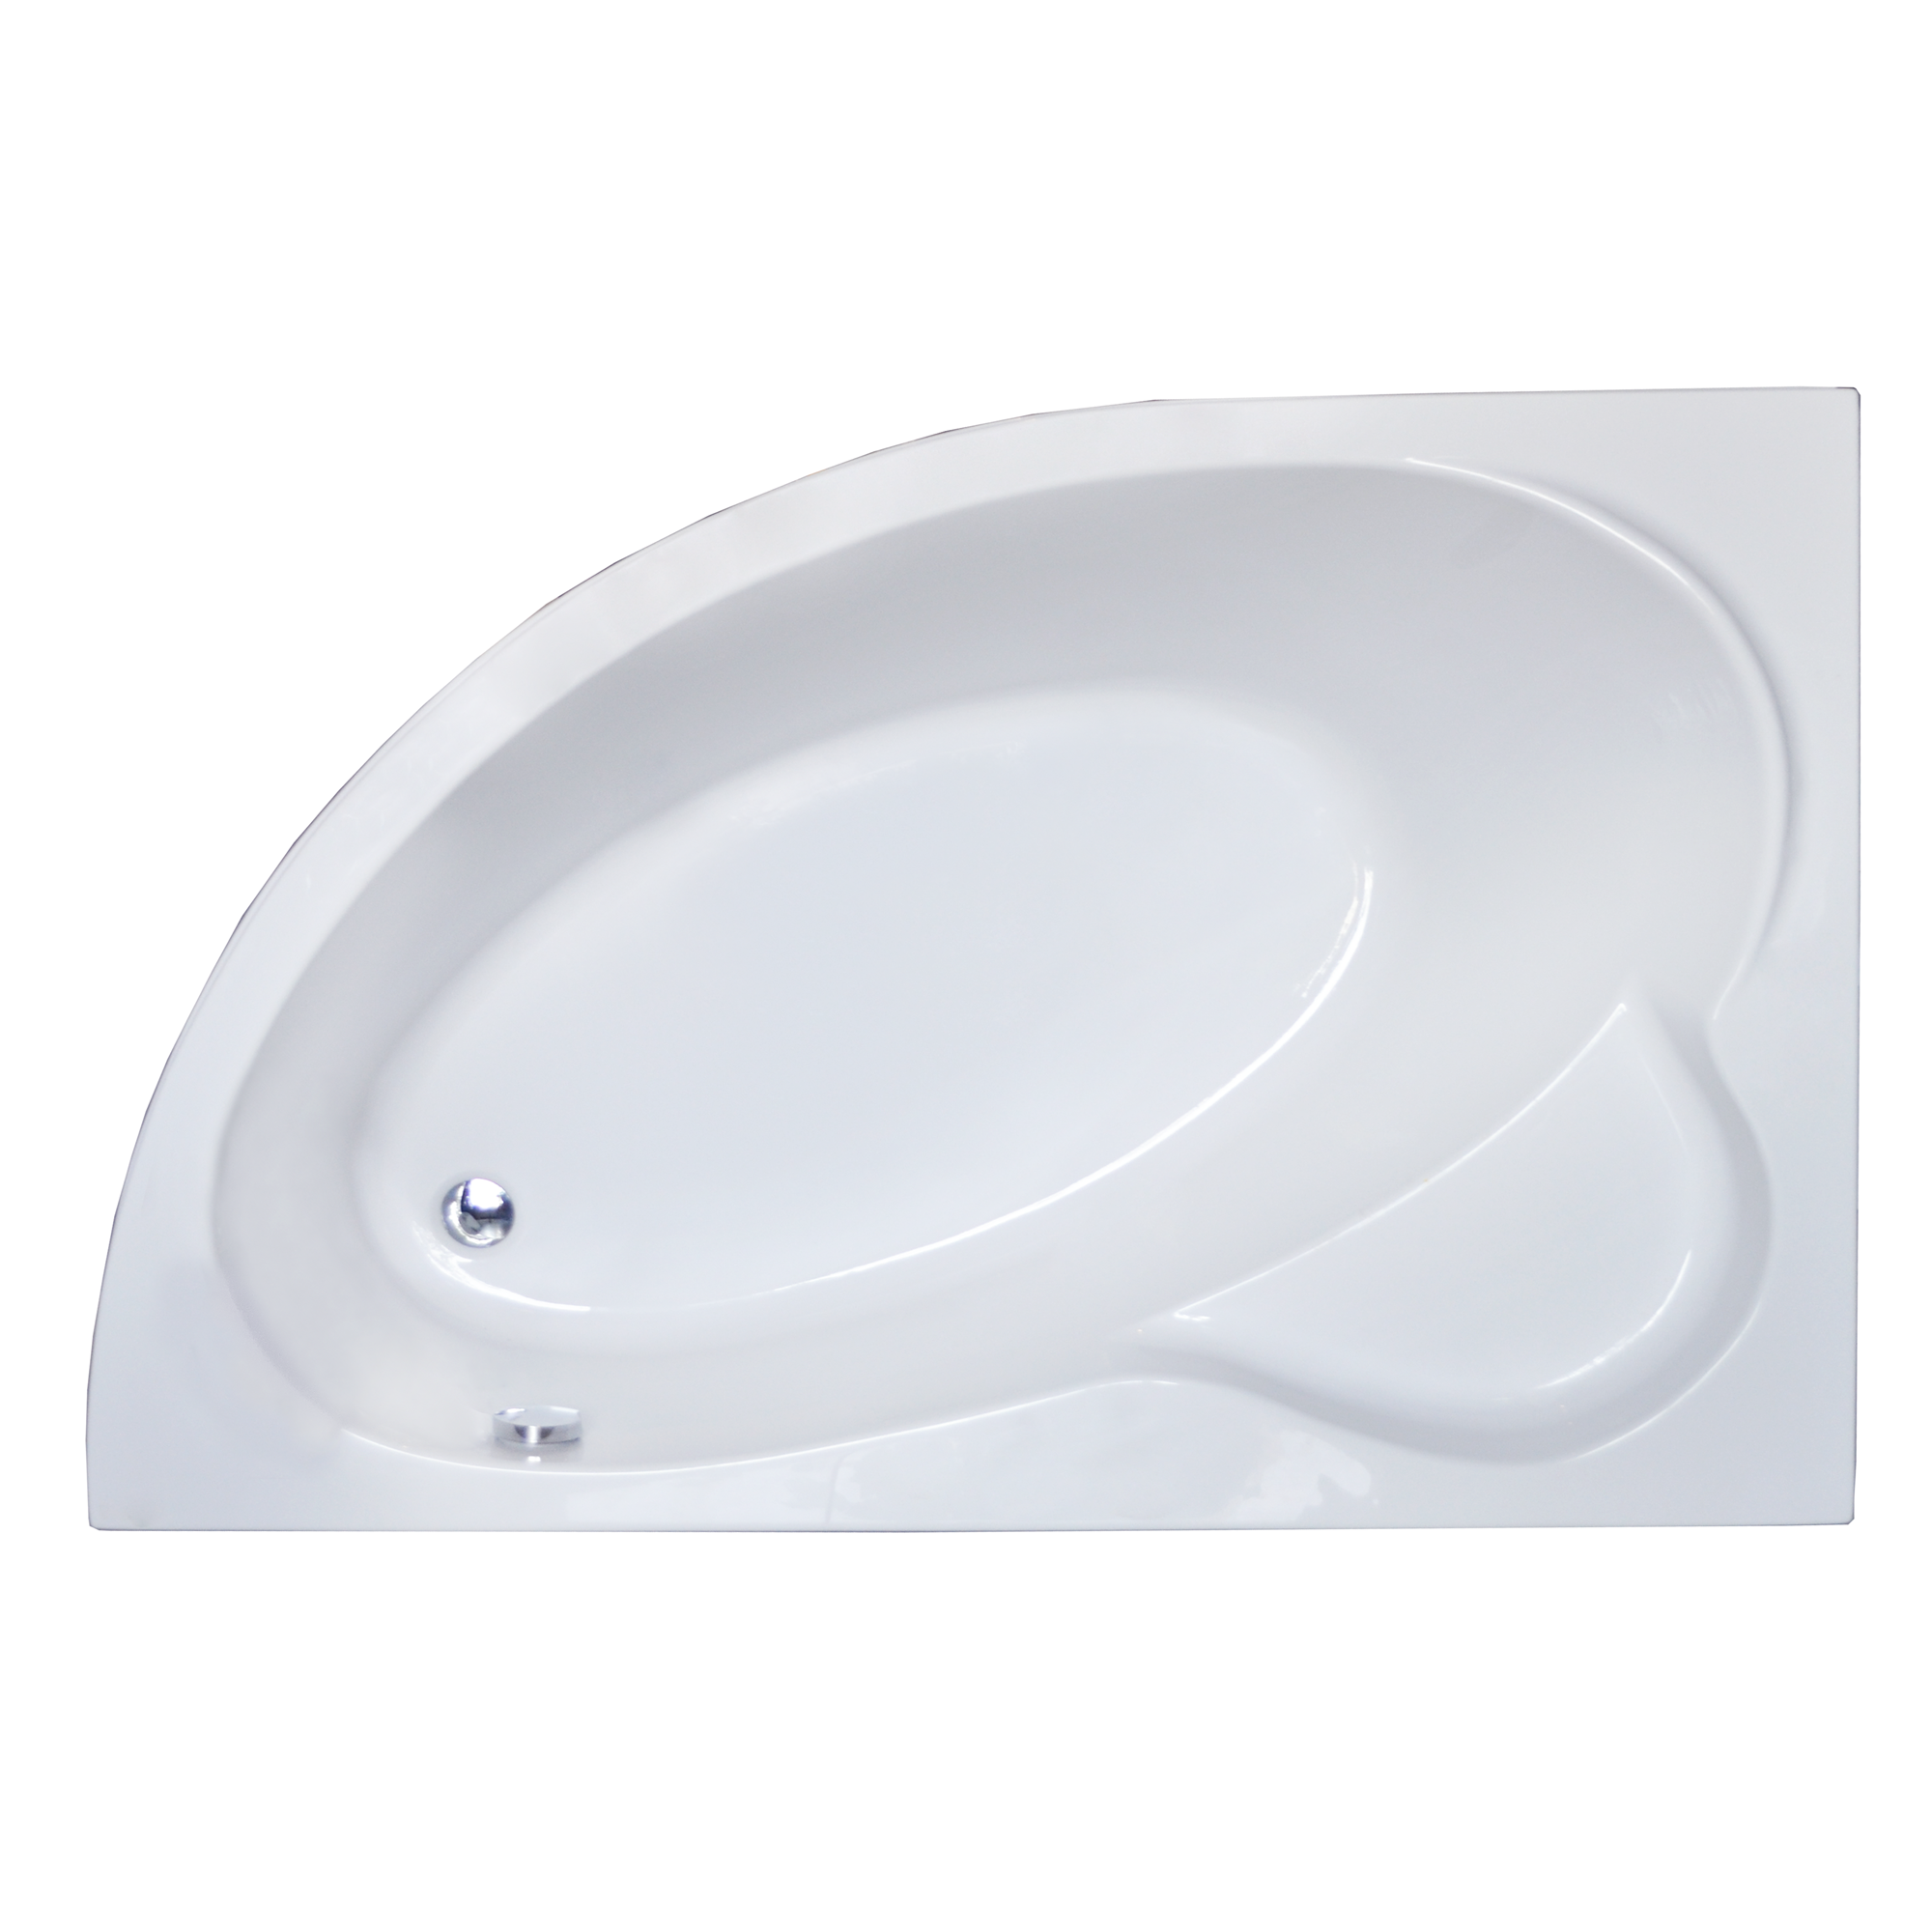 Акриловая ванна Royal bath Alpine RB819102 170х100 L панель фронтальная к ванне royal bath alpine 170 rb819102p